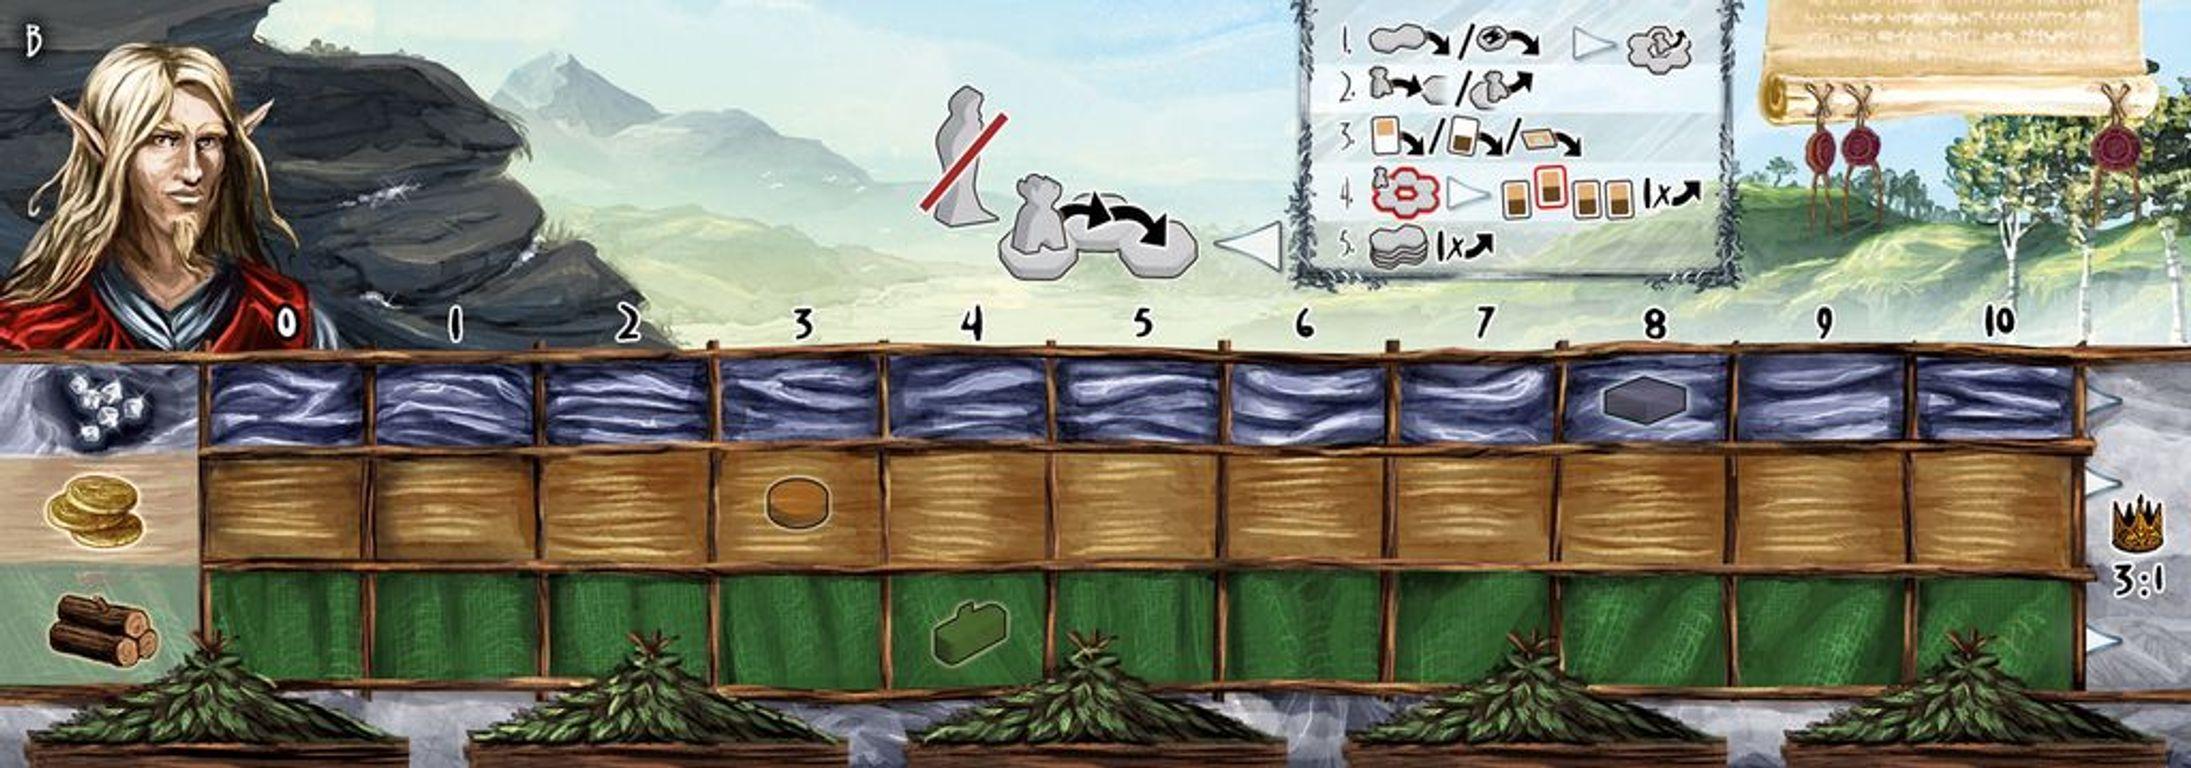 Pandoria game board